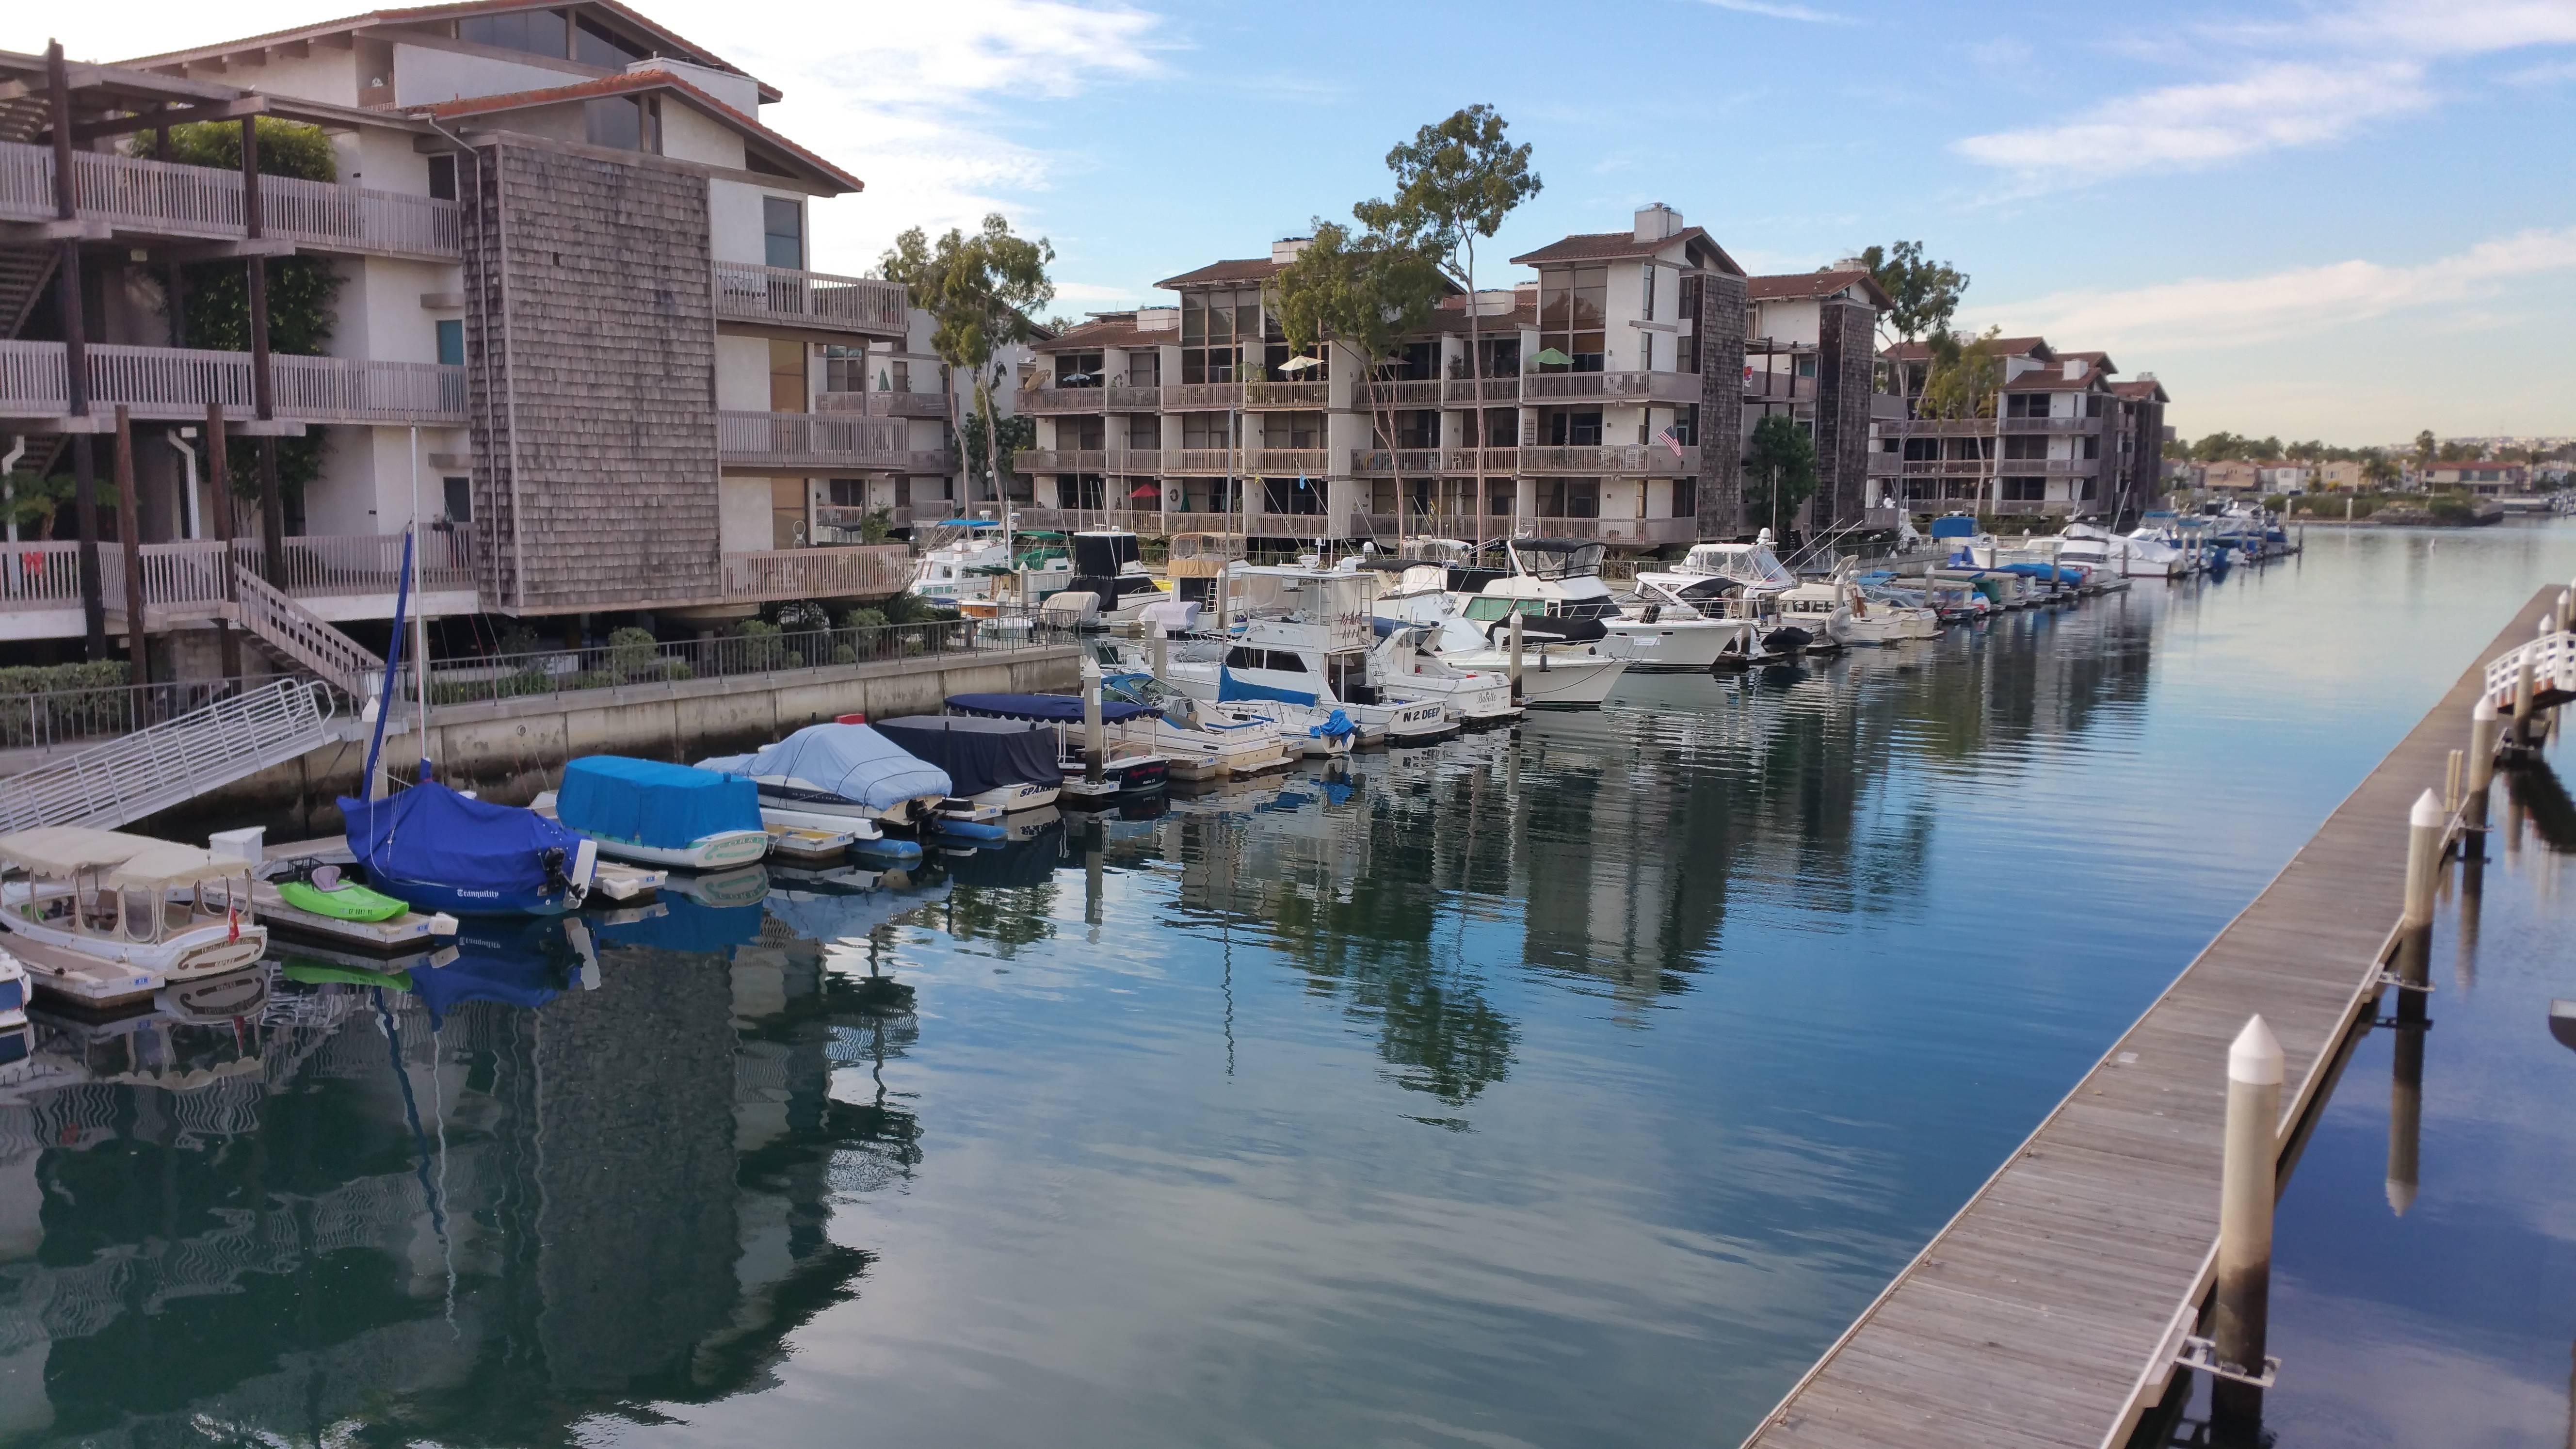 Marina Pacifica In Long Beach Ca Luxury Waterfront Condos